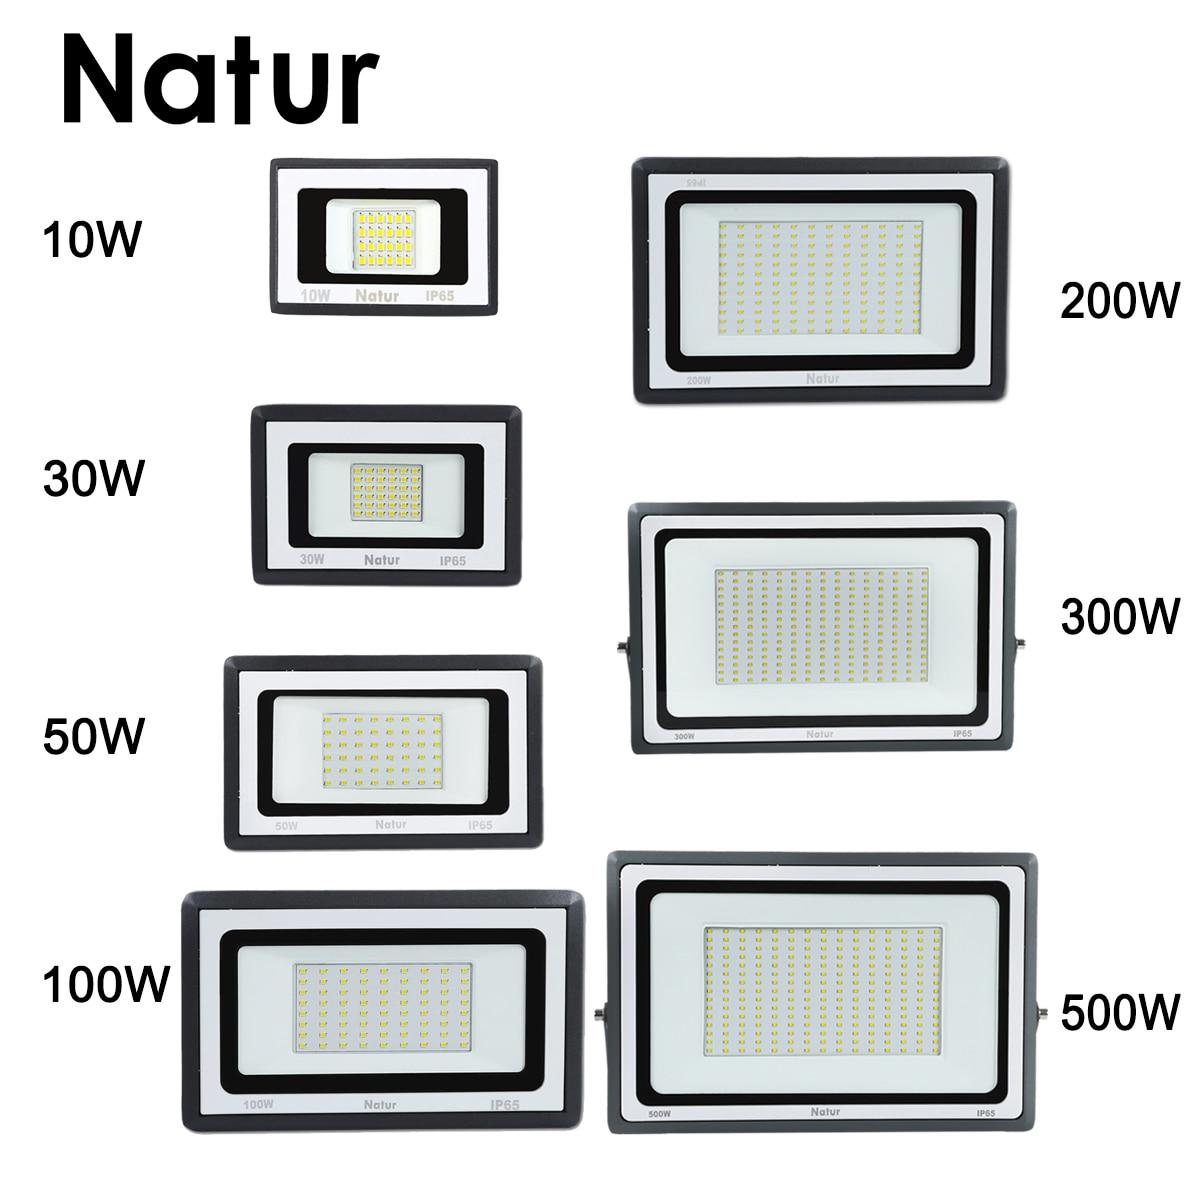 10W 30W 50W 100W 200W 300W 500W Led Spotlight 220V Led Floodlight Ip65 Waterproof Of Flood Light Outdoor Led Spotlight Reflector